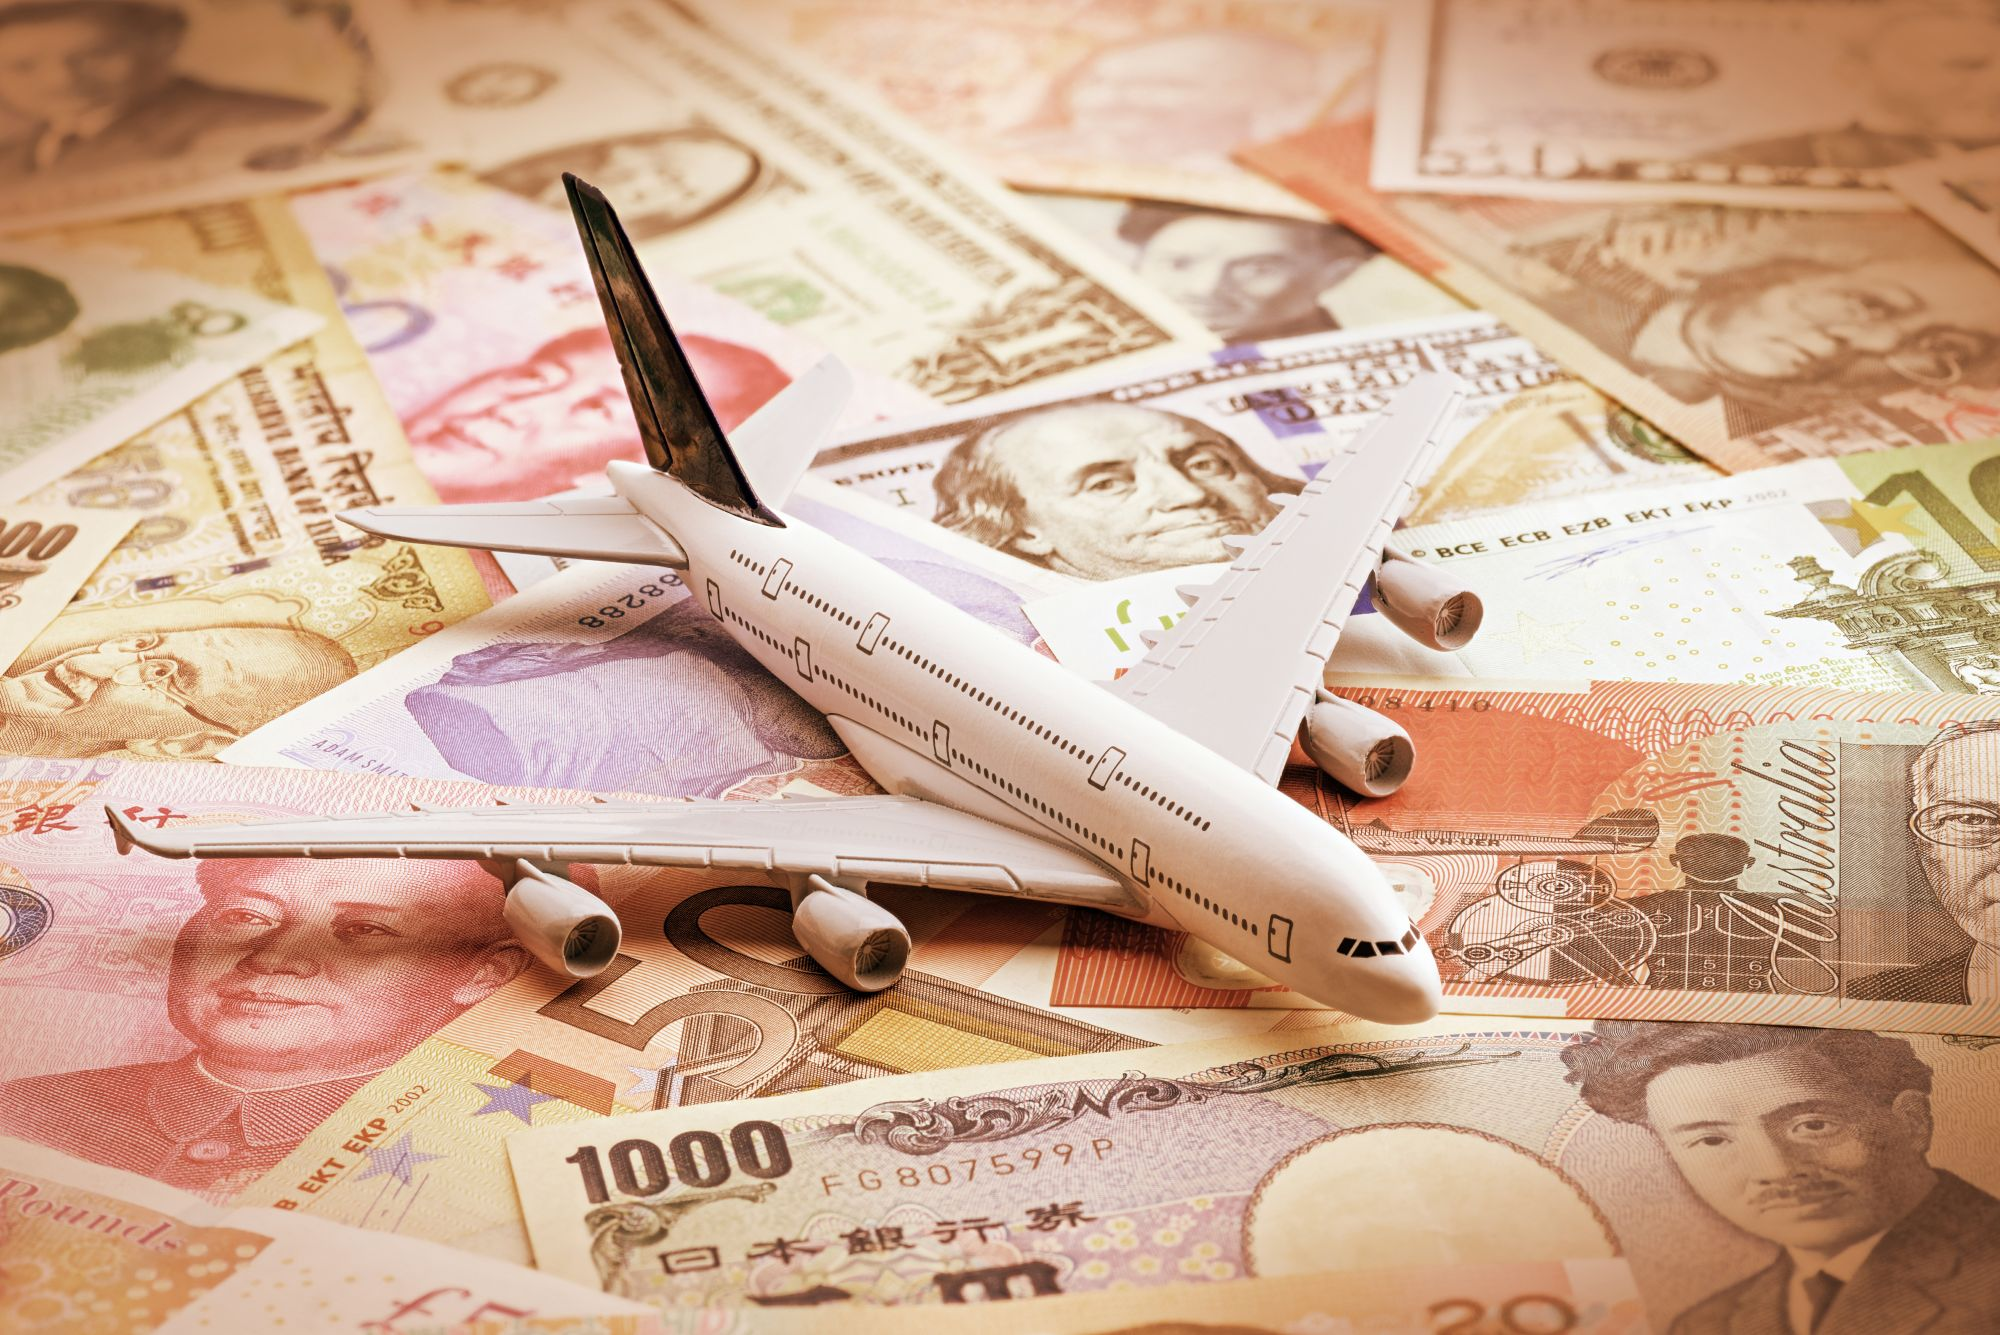 Samolot i banknoty